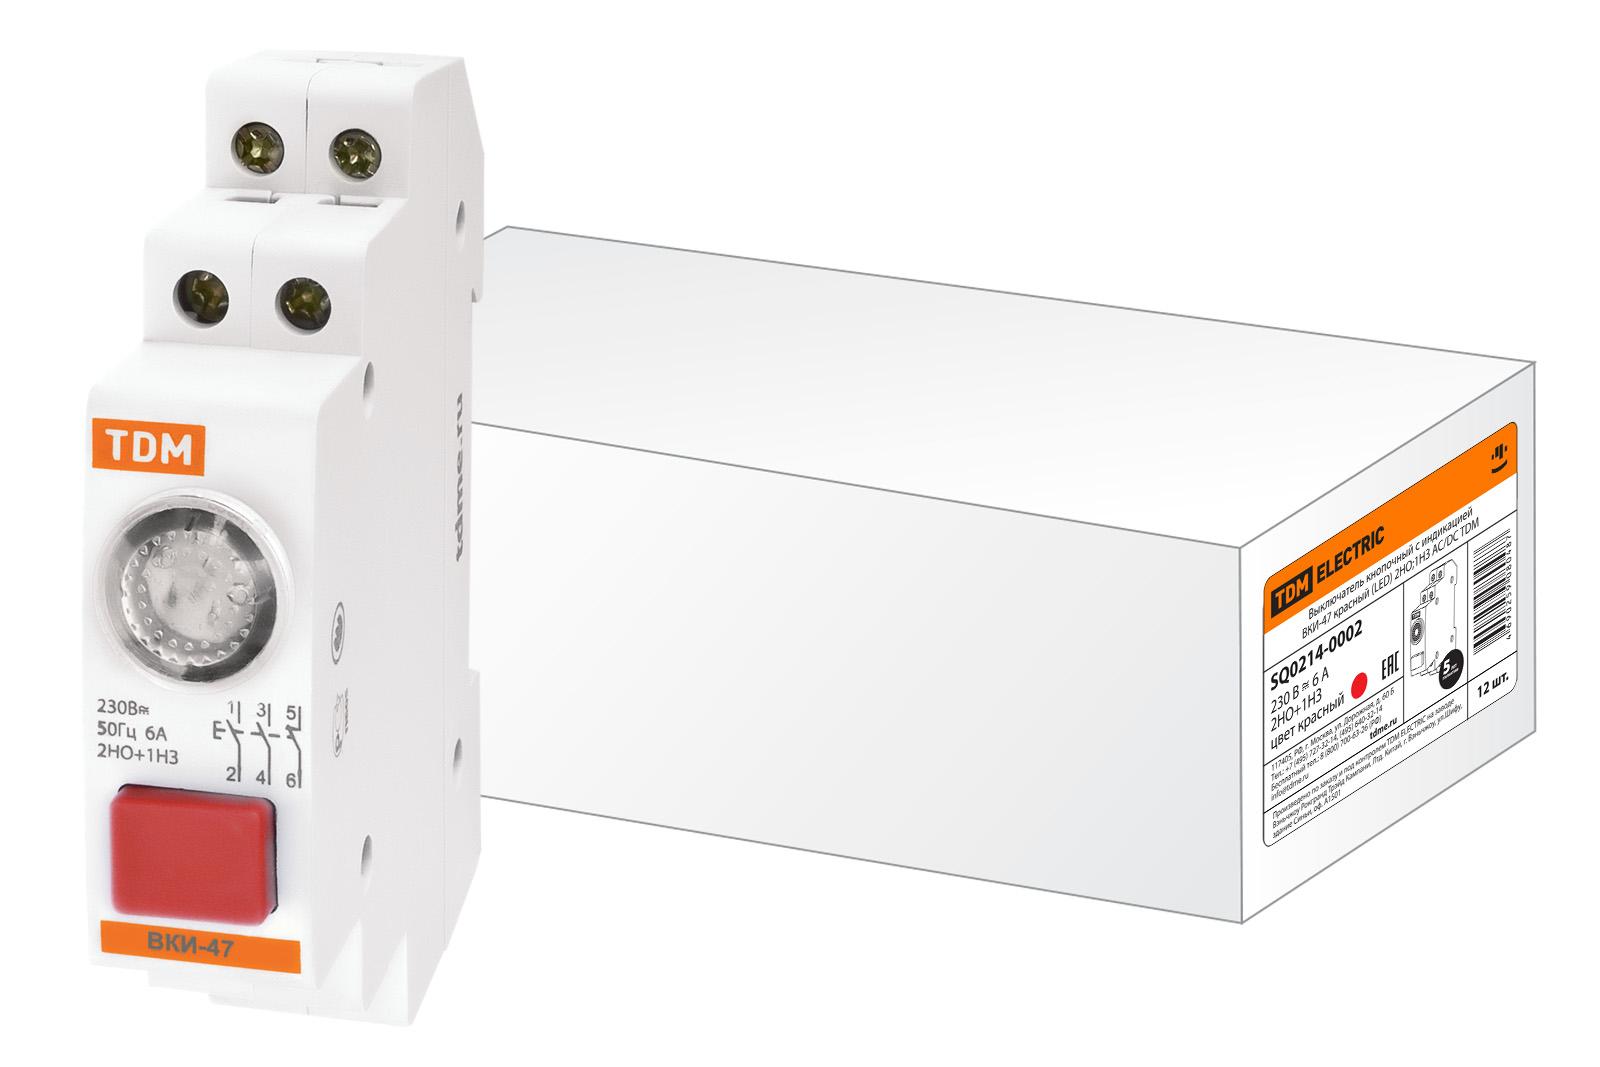 Выключатель Tdm Sq0214-0002 polyurea paint to machine powder paint spray gun air spray paint gun professional spray gun spray gun lvlp